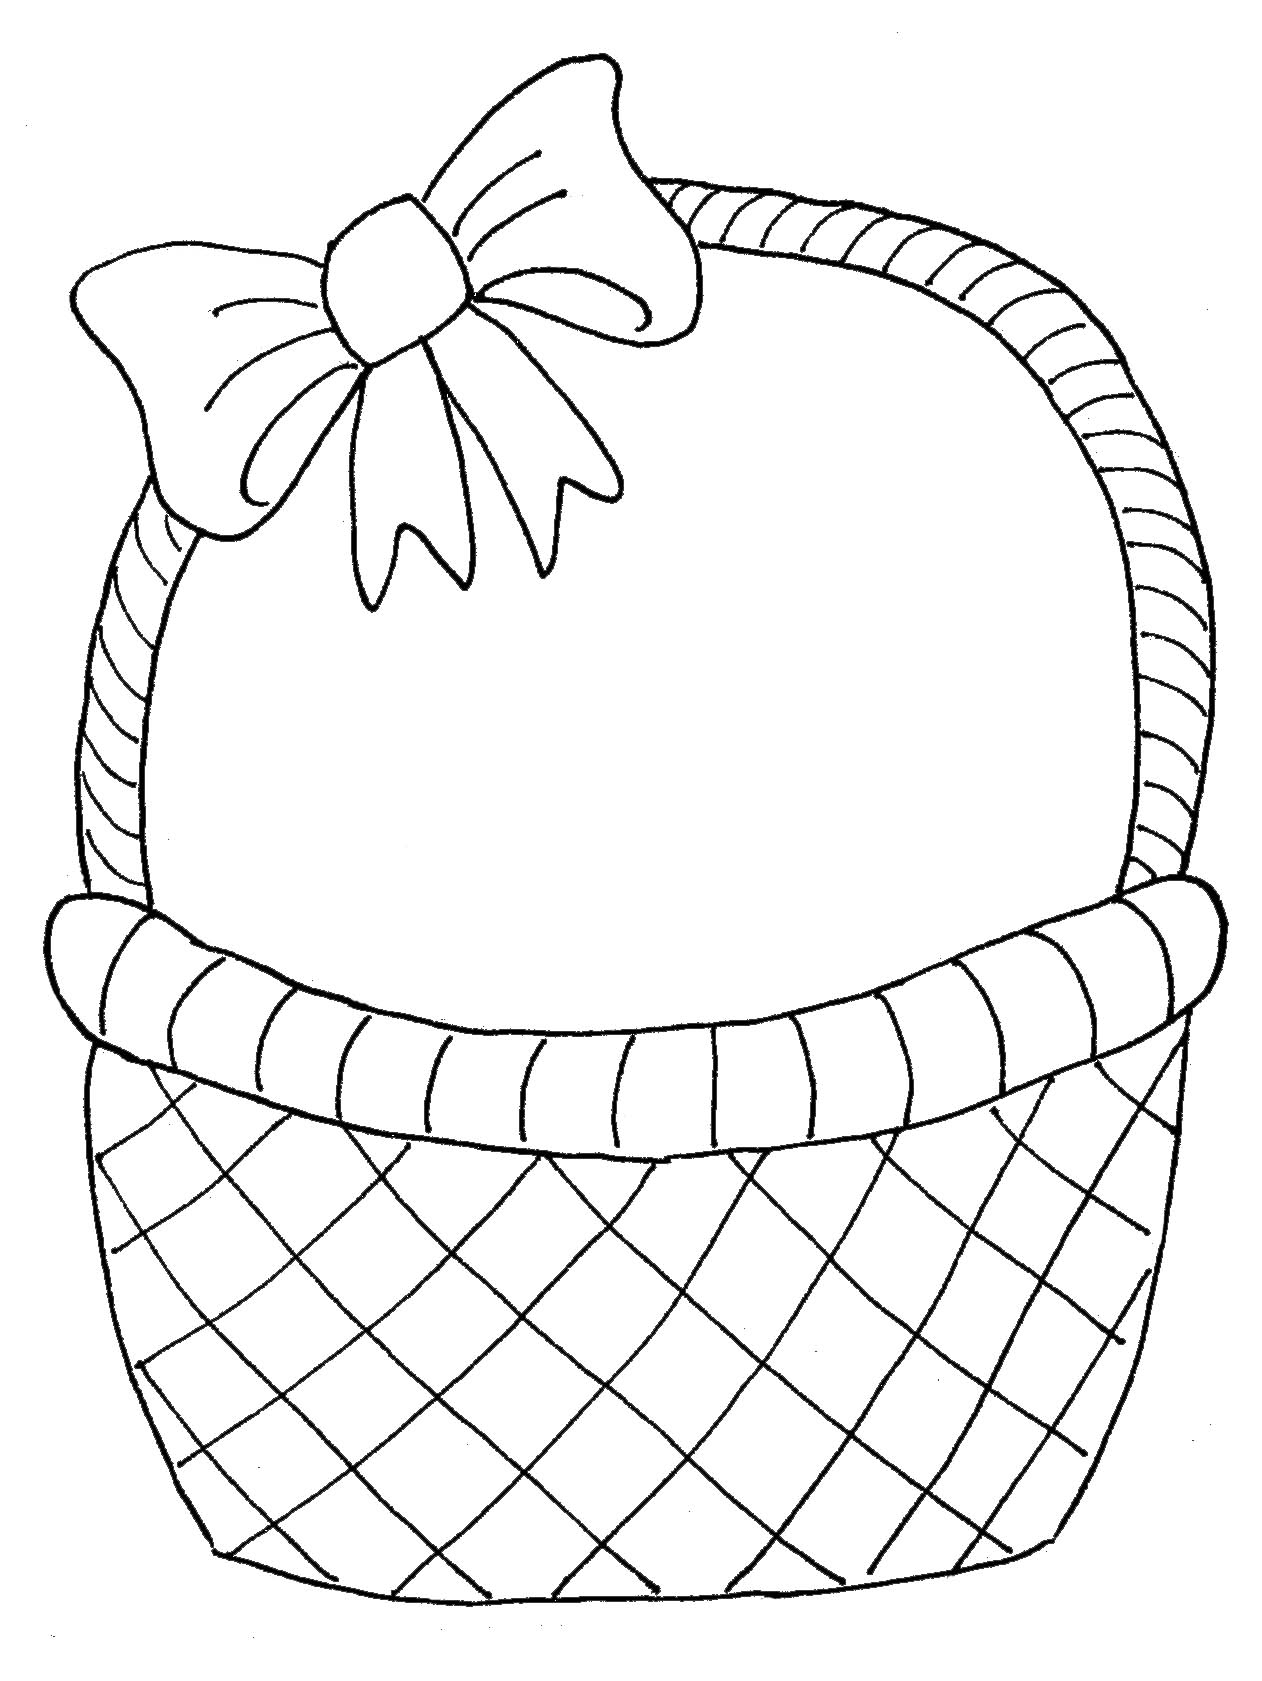 Fruit Basket Drawing At Getdrawings